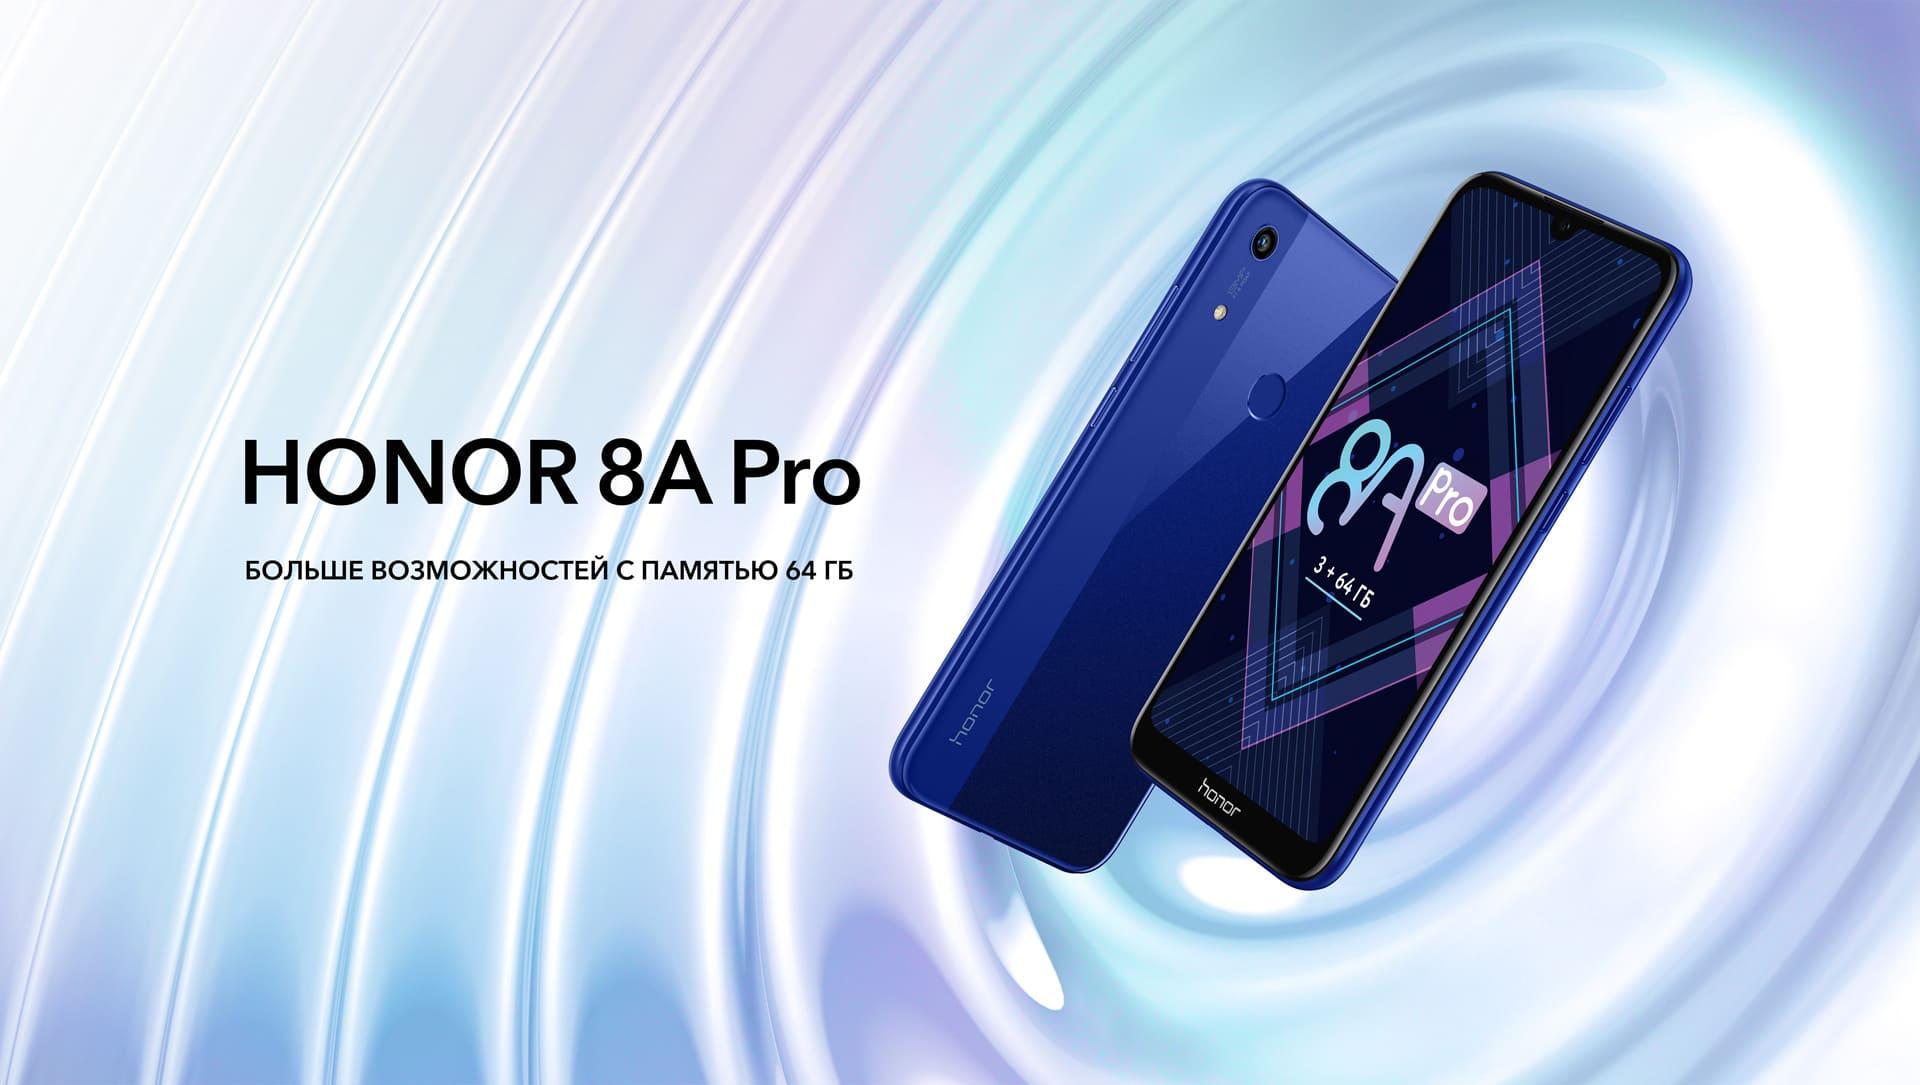 Honor 8A Pro – новинка с Helio P35 в России